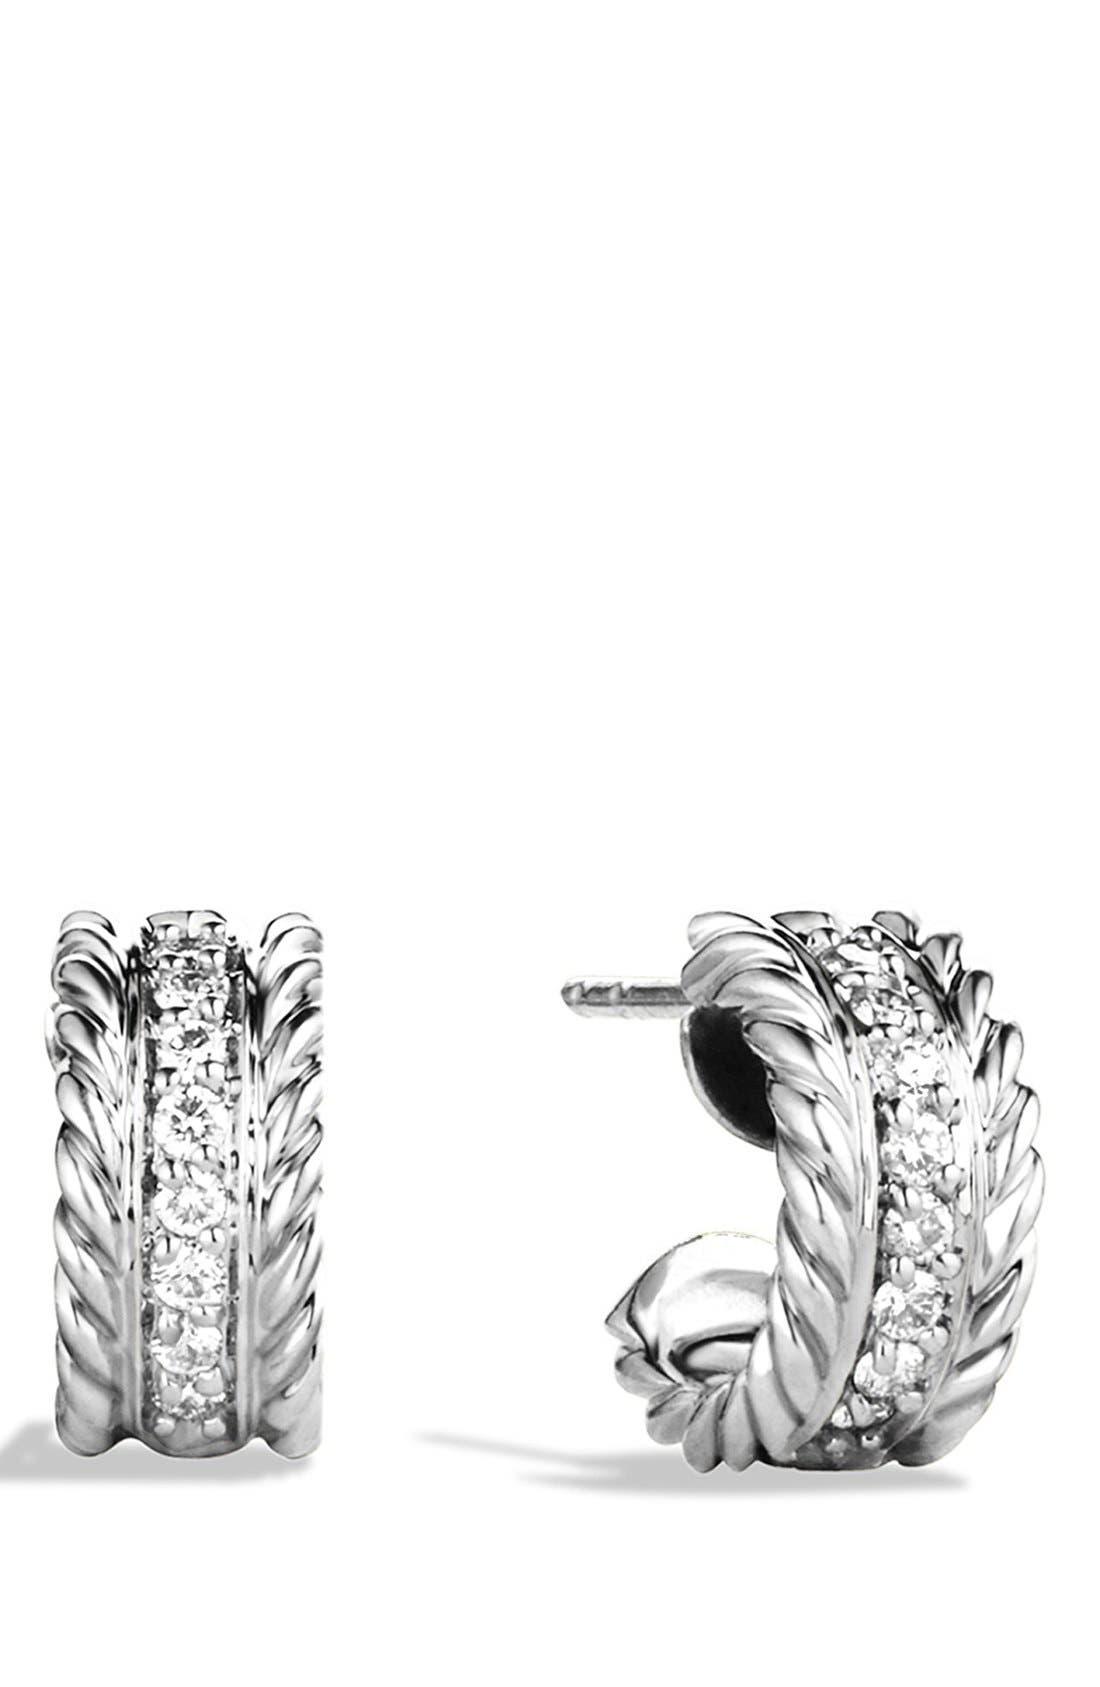 David Yurman 'Cable Classics' Extra-Small Earrings with Diamonds